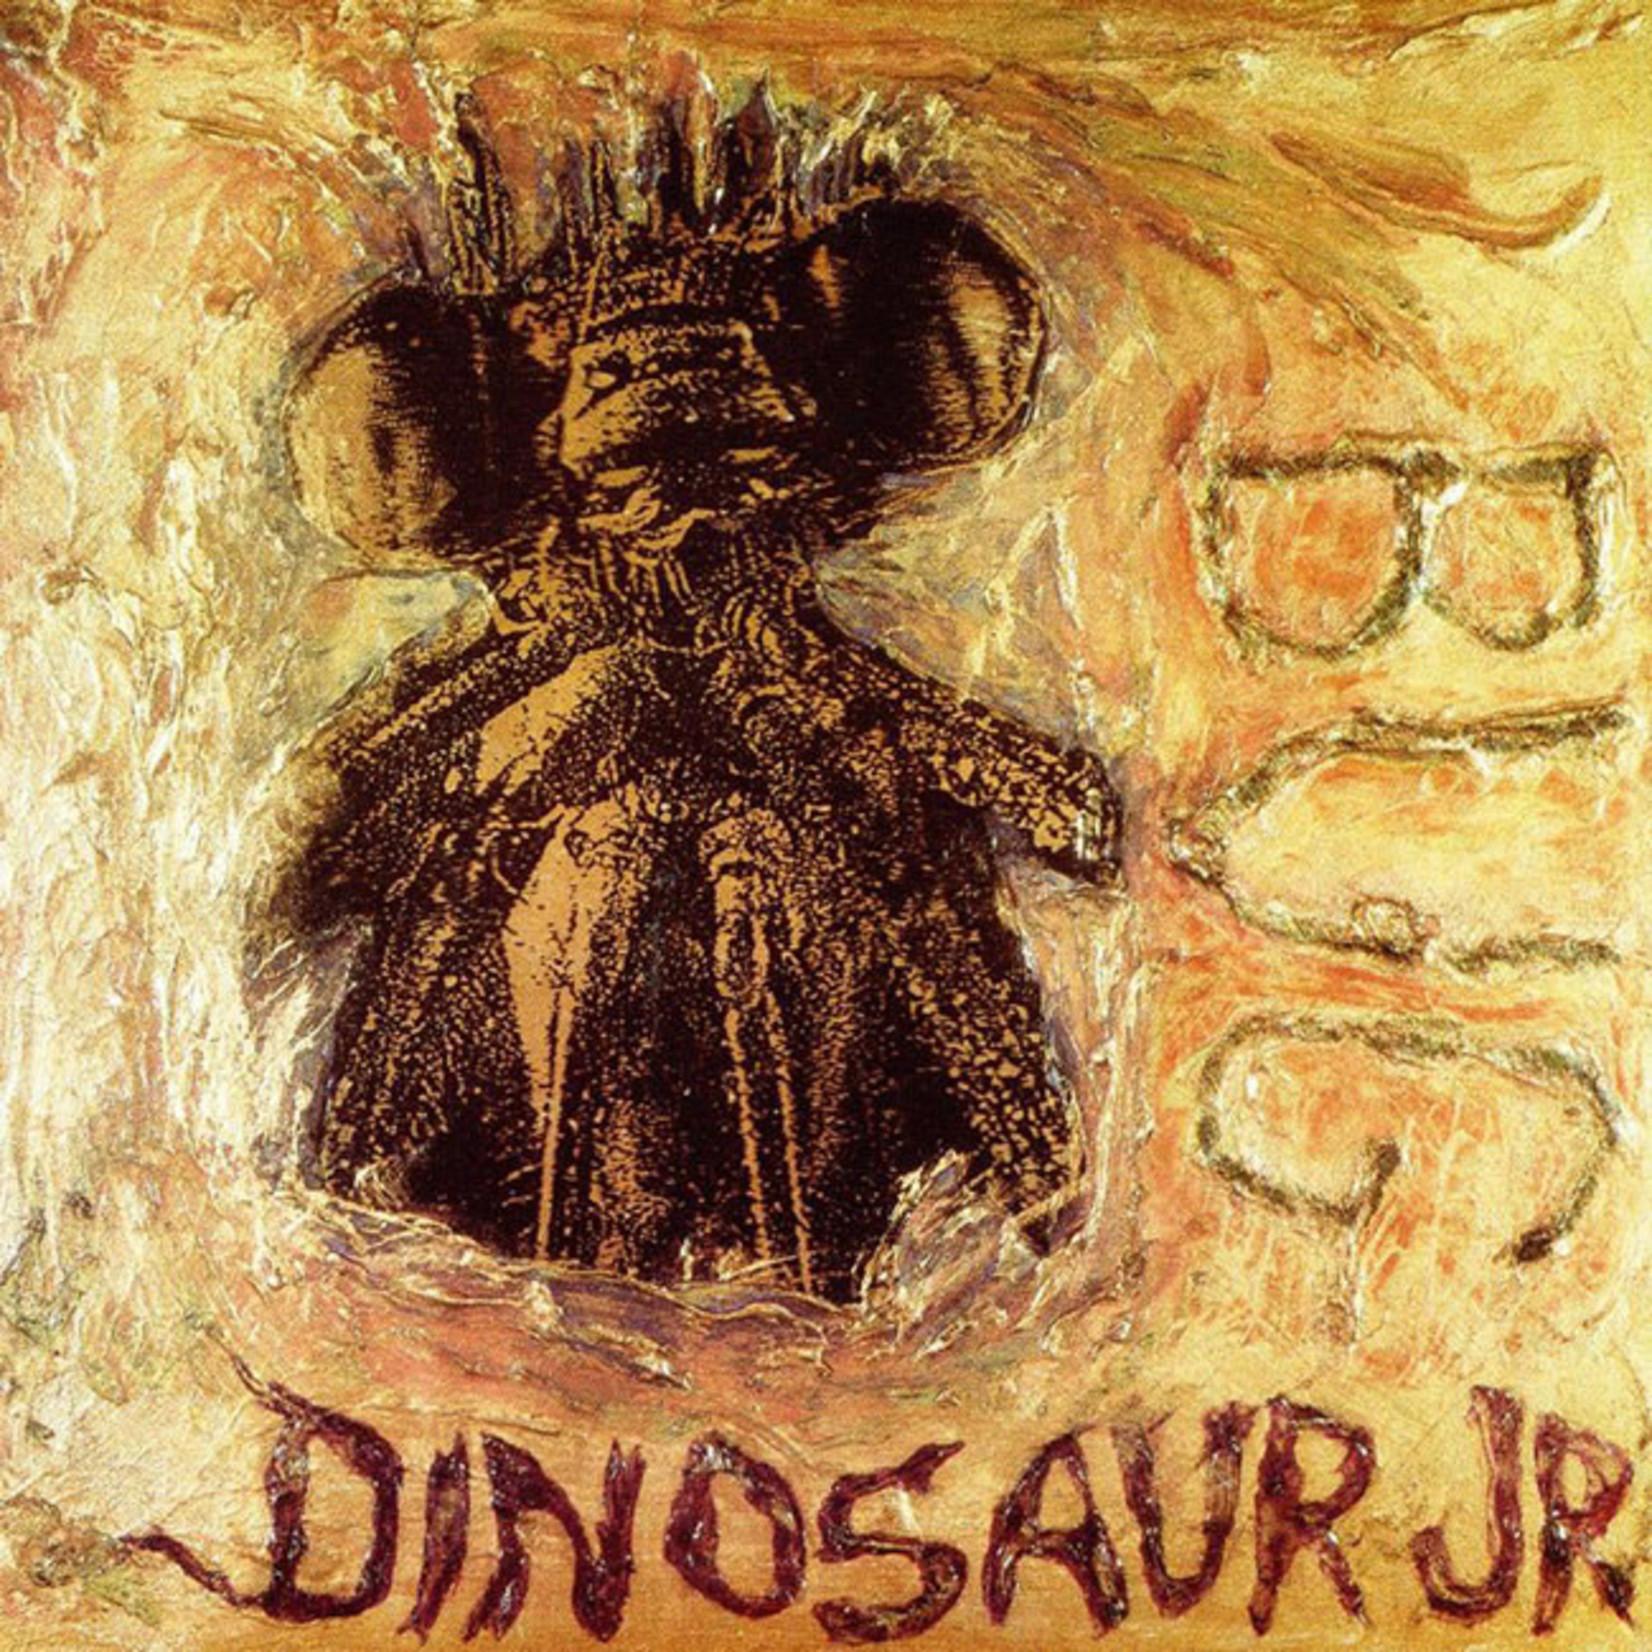 [New] Dinosaur Jr.: Bug